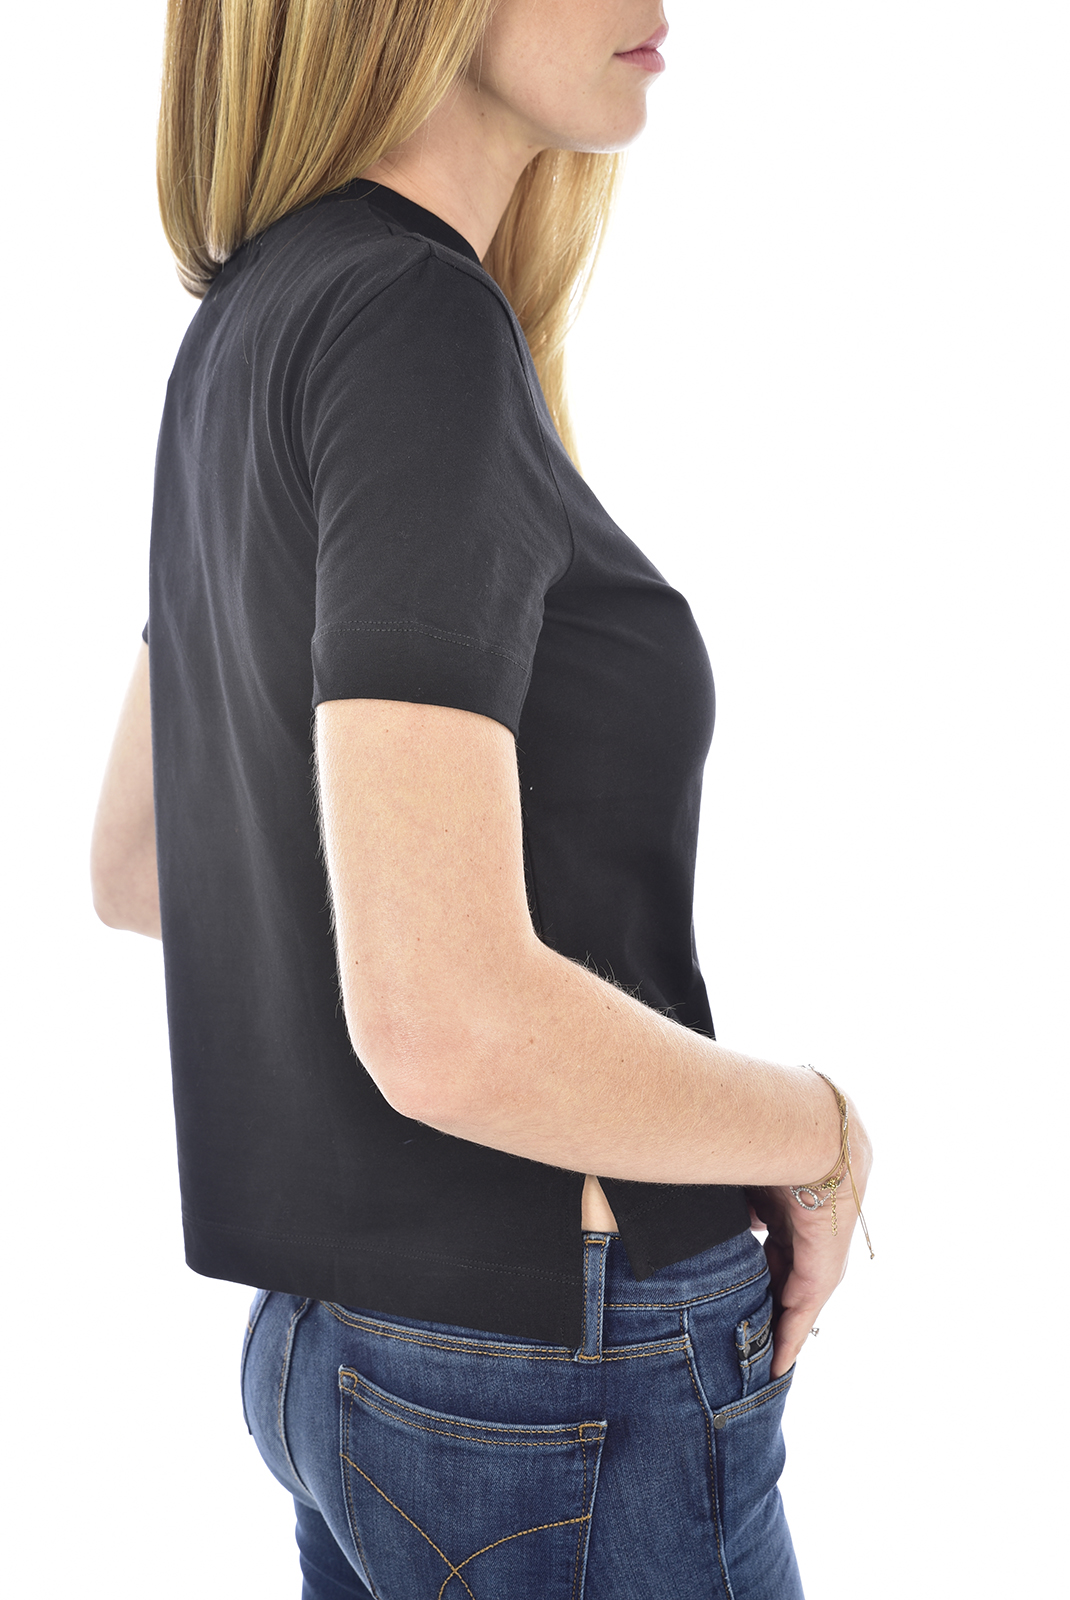 Tee shirt  Calvin klein J20J212879 BLACK